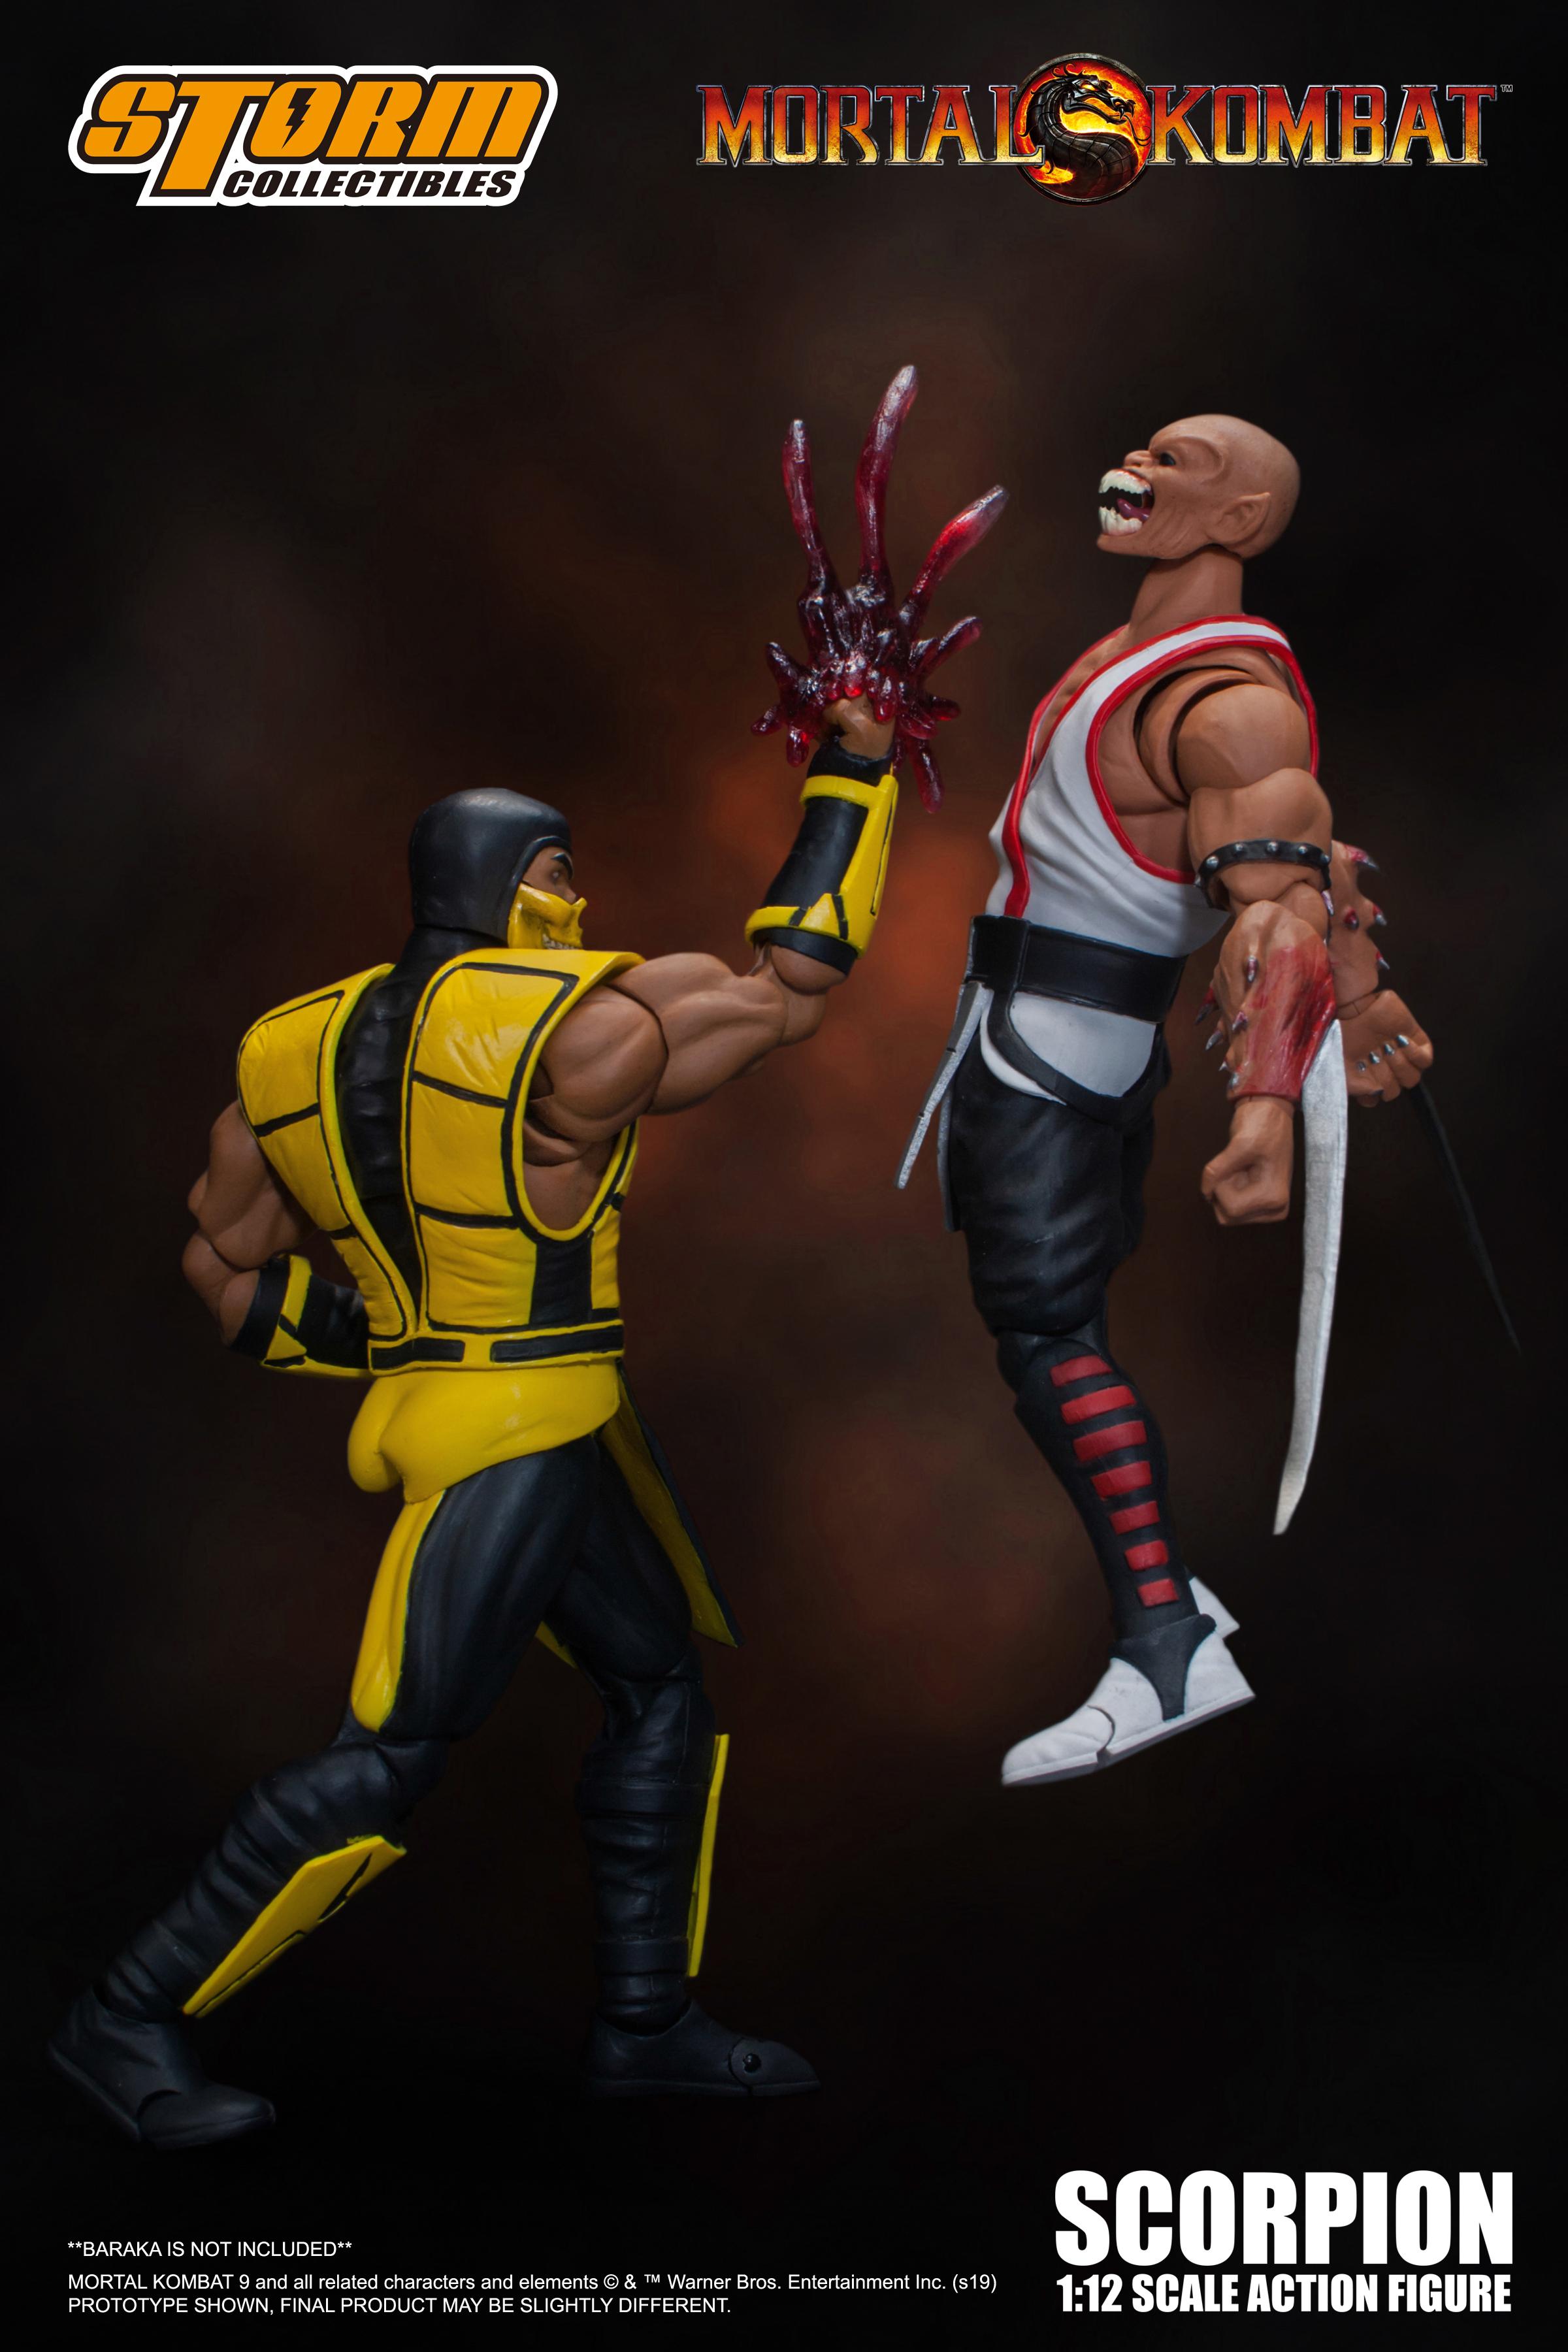 Storm Collectibles Mortal Kombat 3 Scorpion